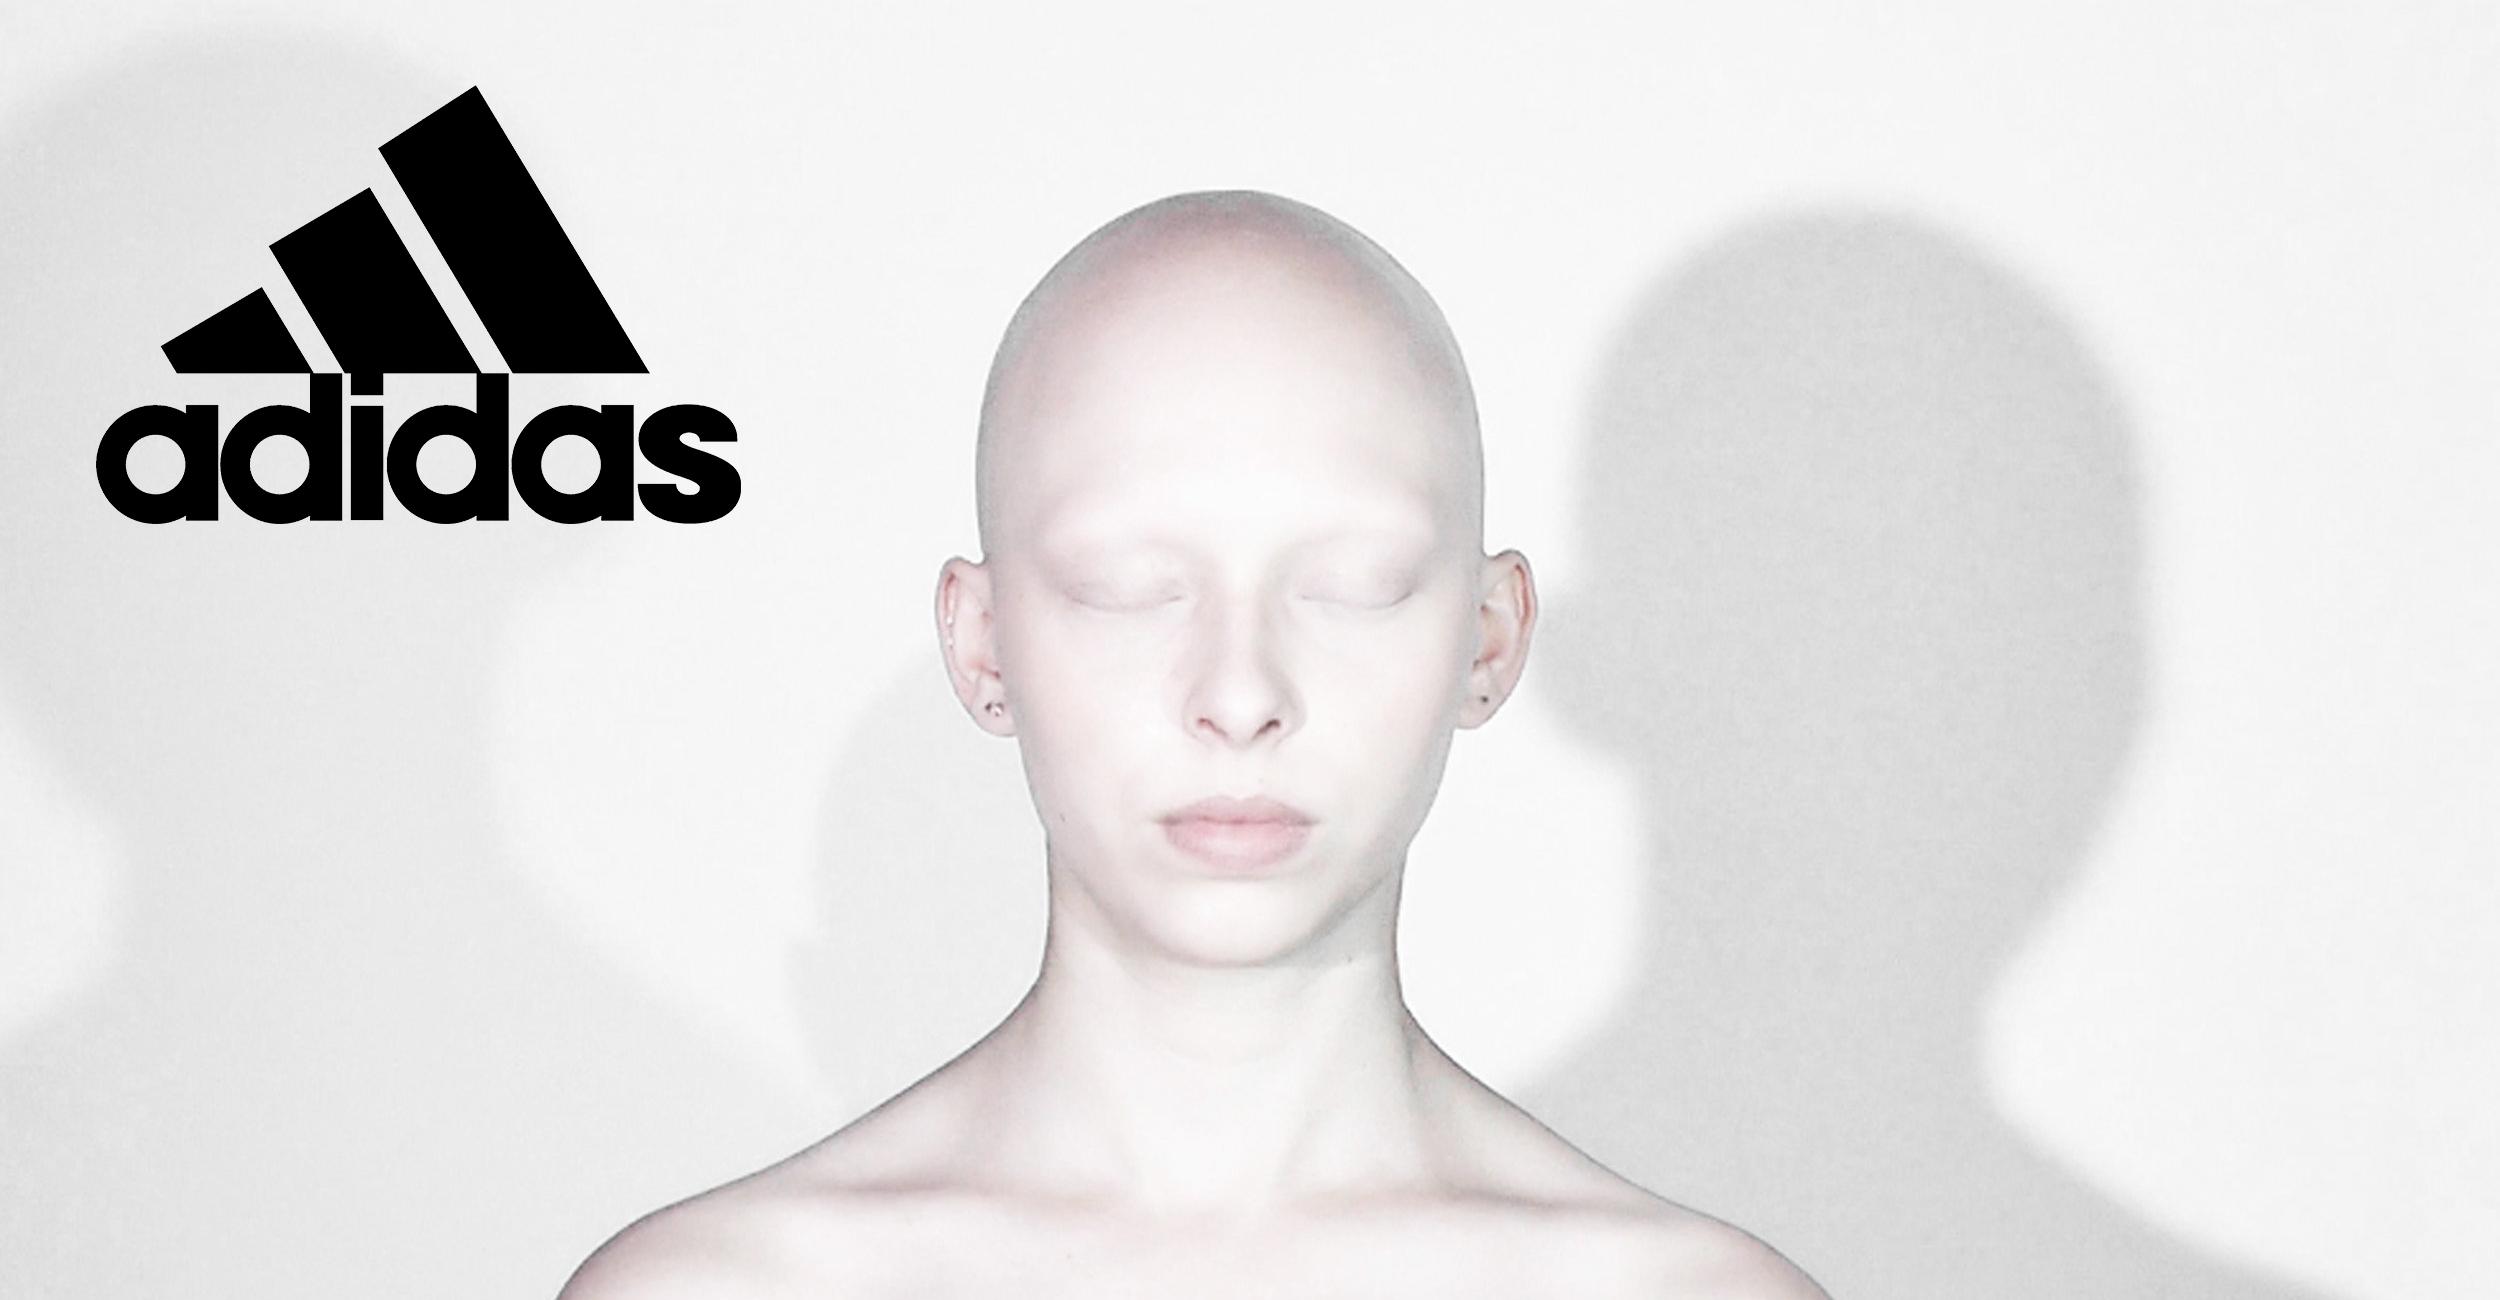 adidas-cover.jpg